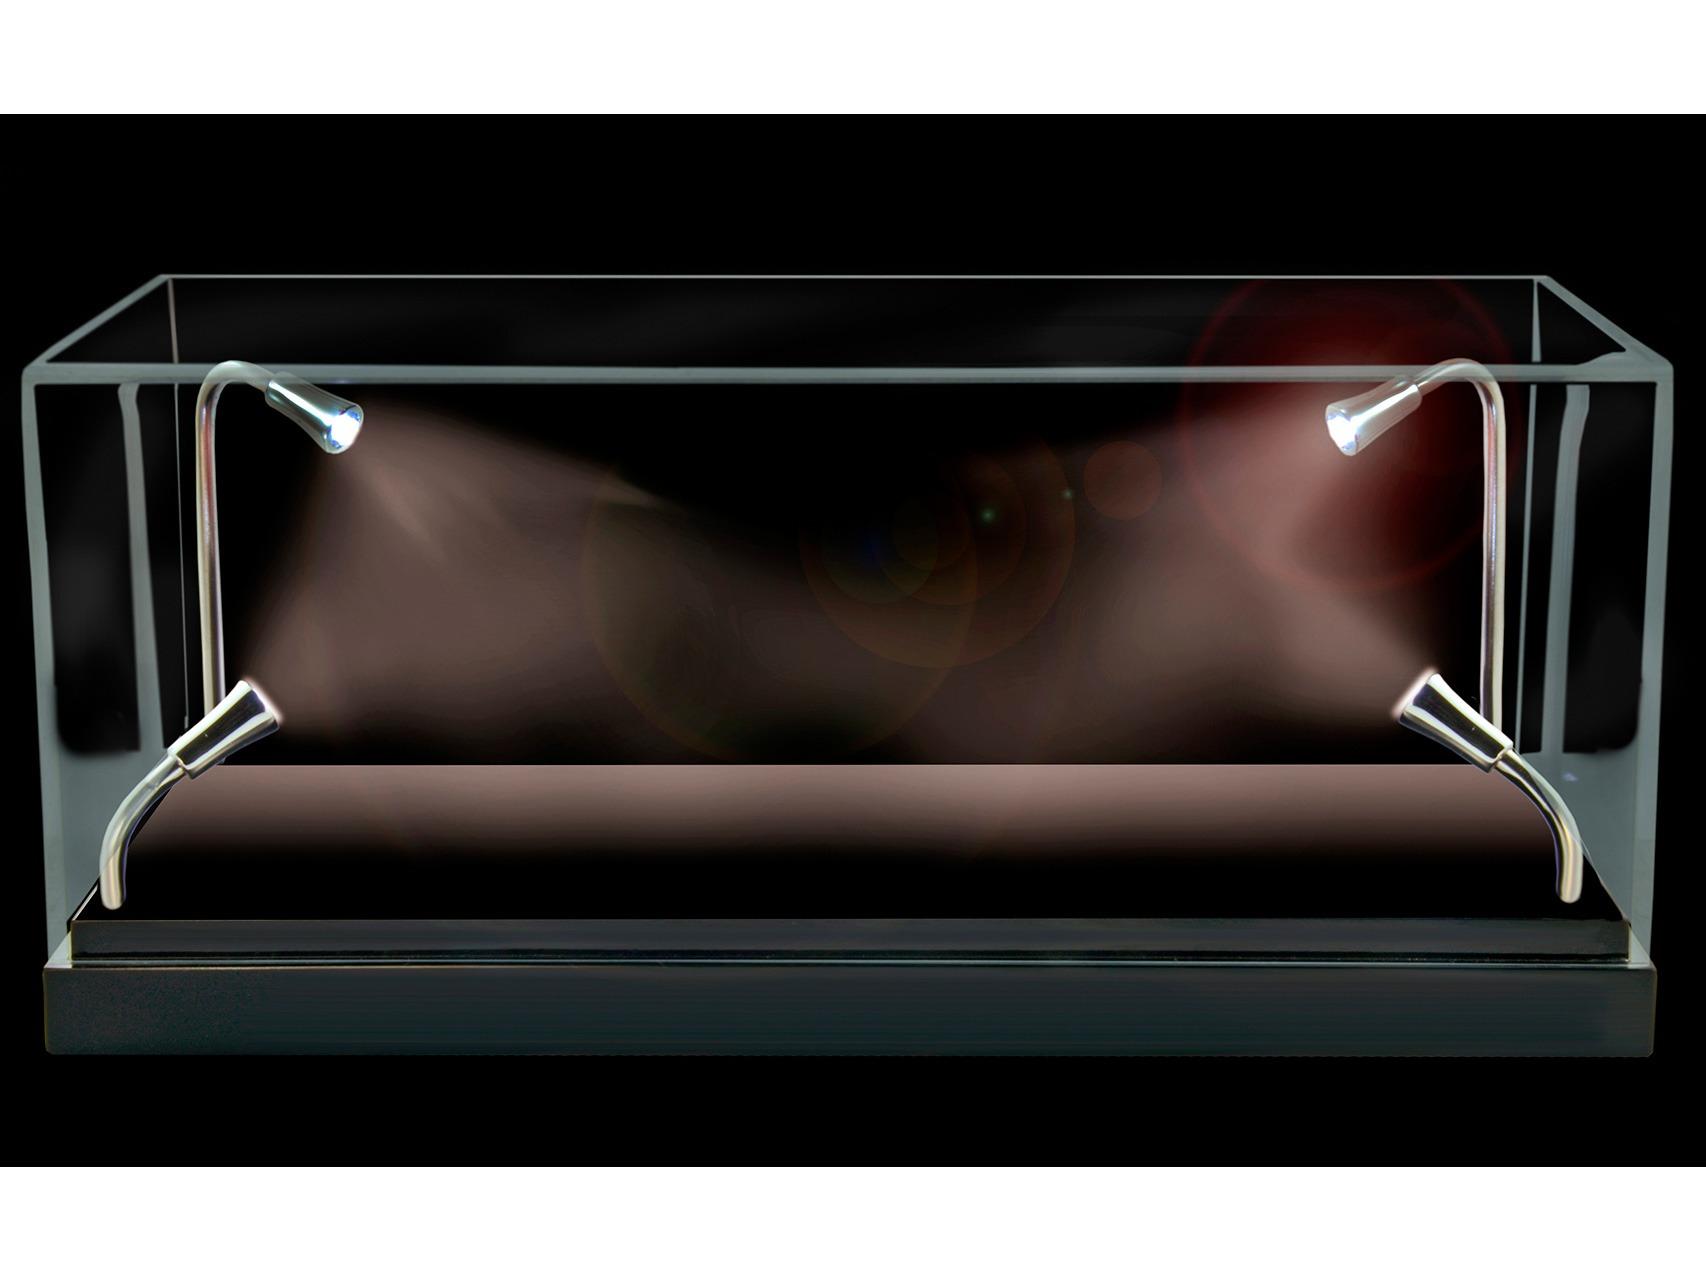 Trax 1/43 Lighting Display Case